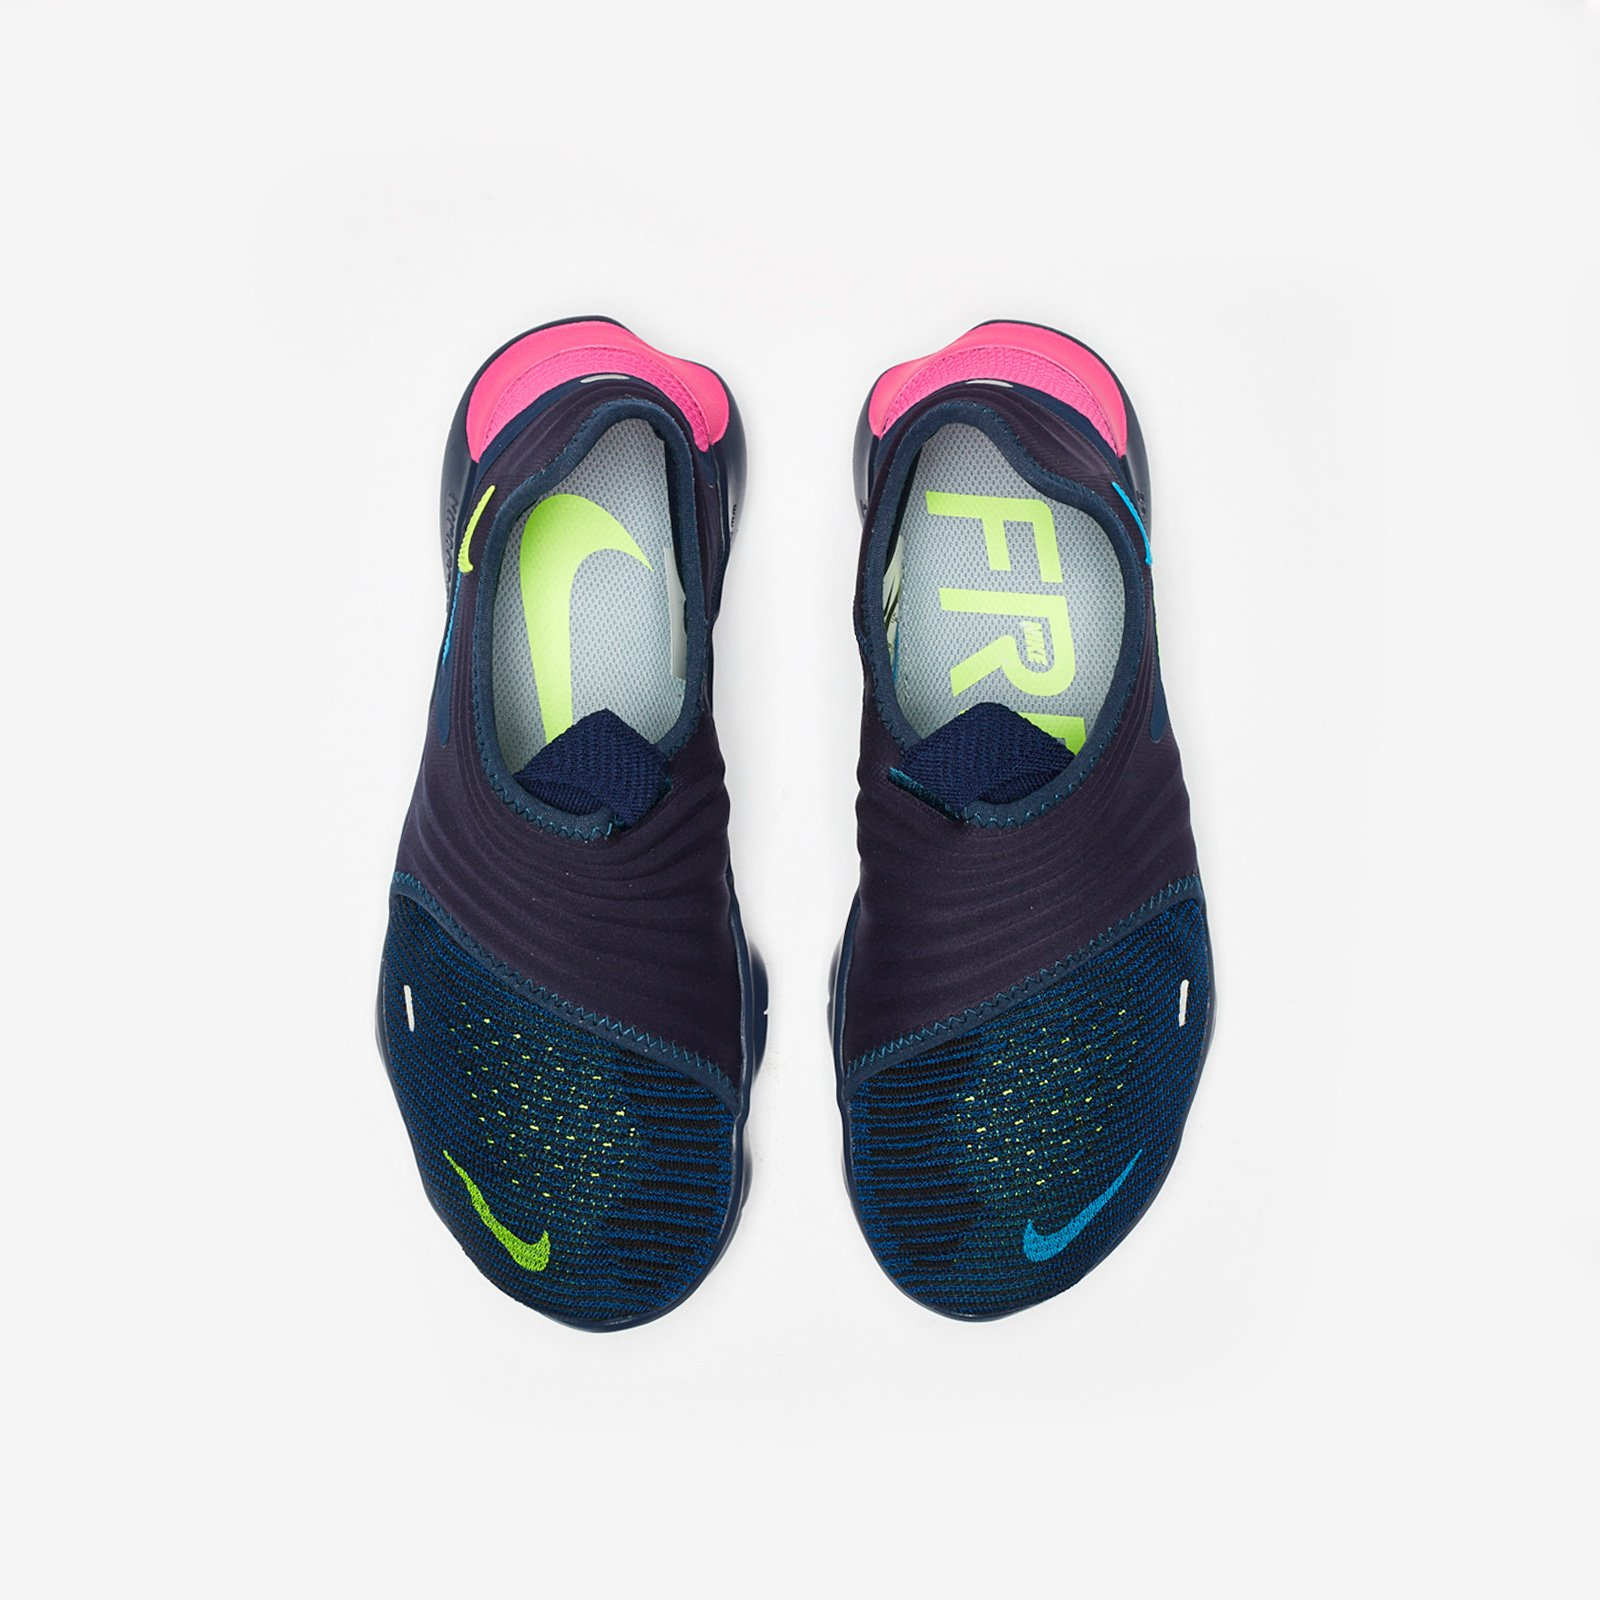 Nike Free RN Flyknit 3.0 Aq5707 004 Sneakersnstuff